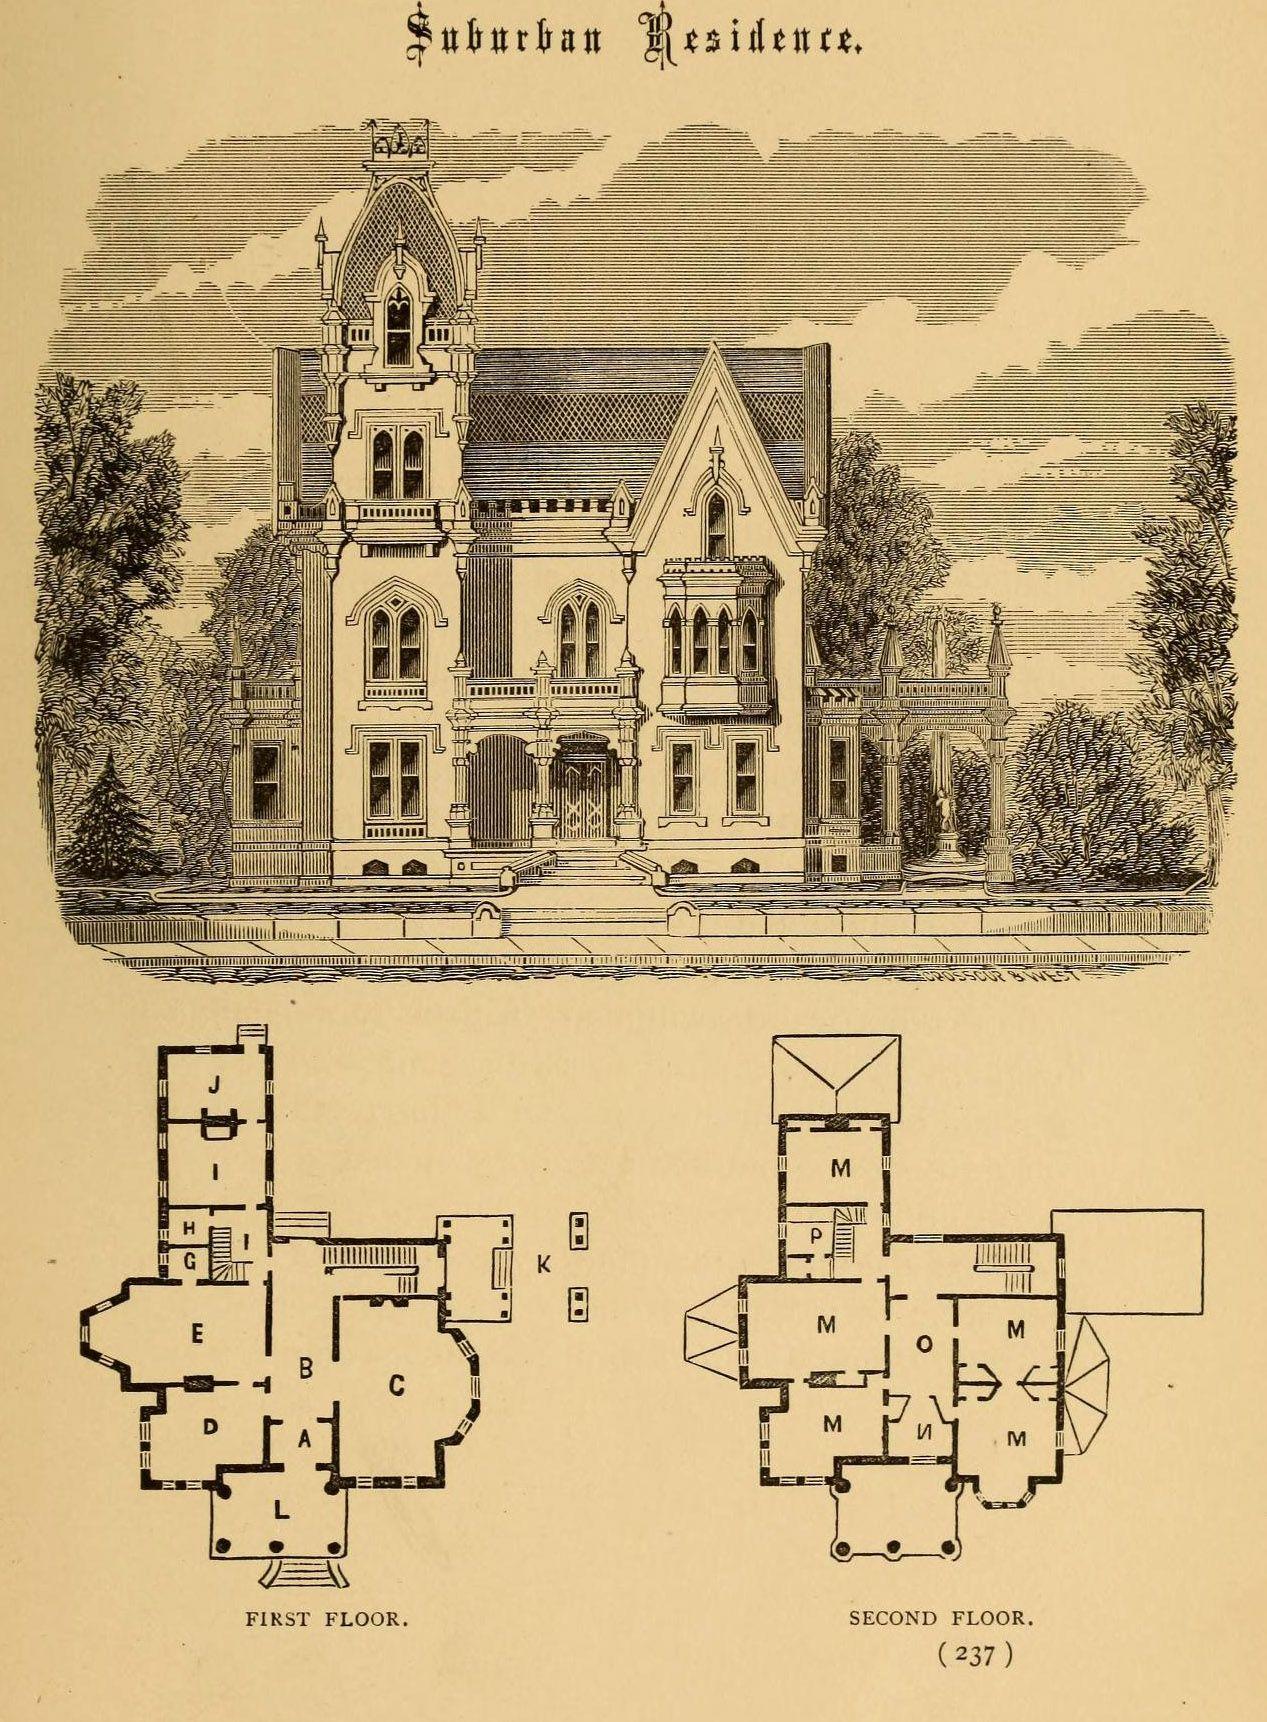 Pin De Dustin Hedrick En Victorian Style Houses Casas Victorianas Planos De Casas Arquitectura